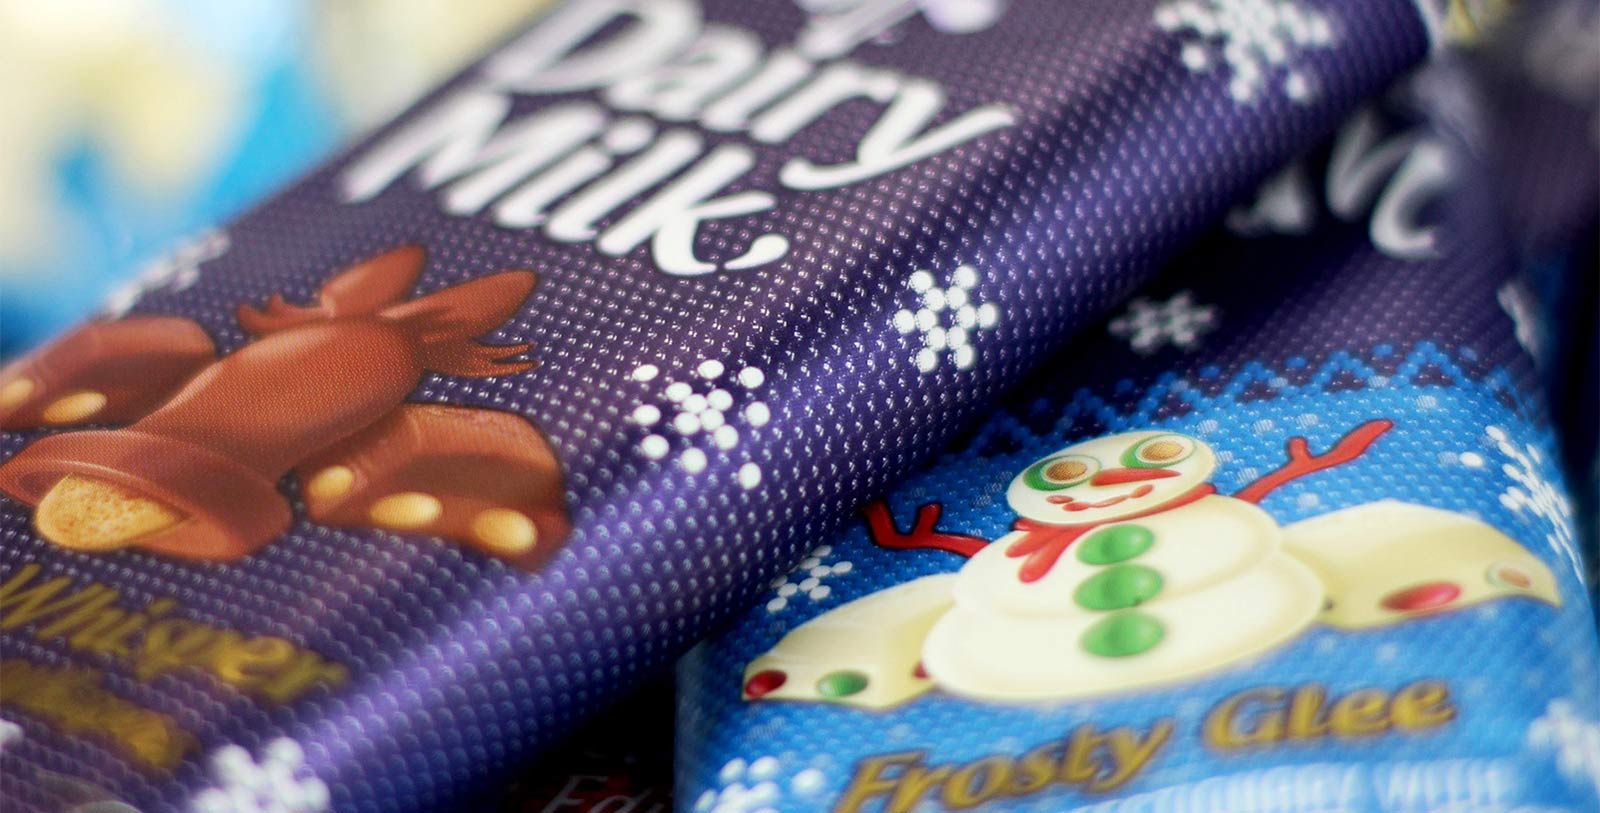 Cadbury's Festive Limited Edition